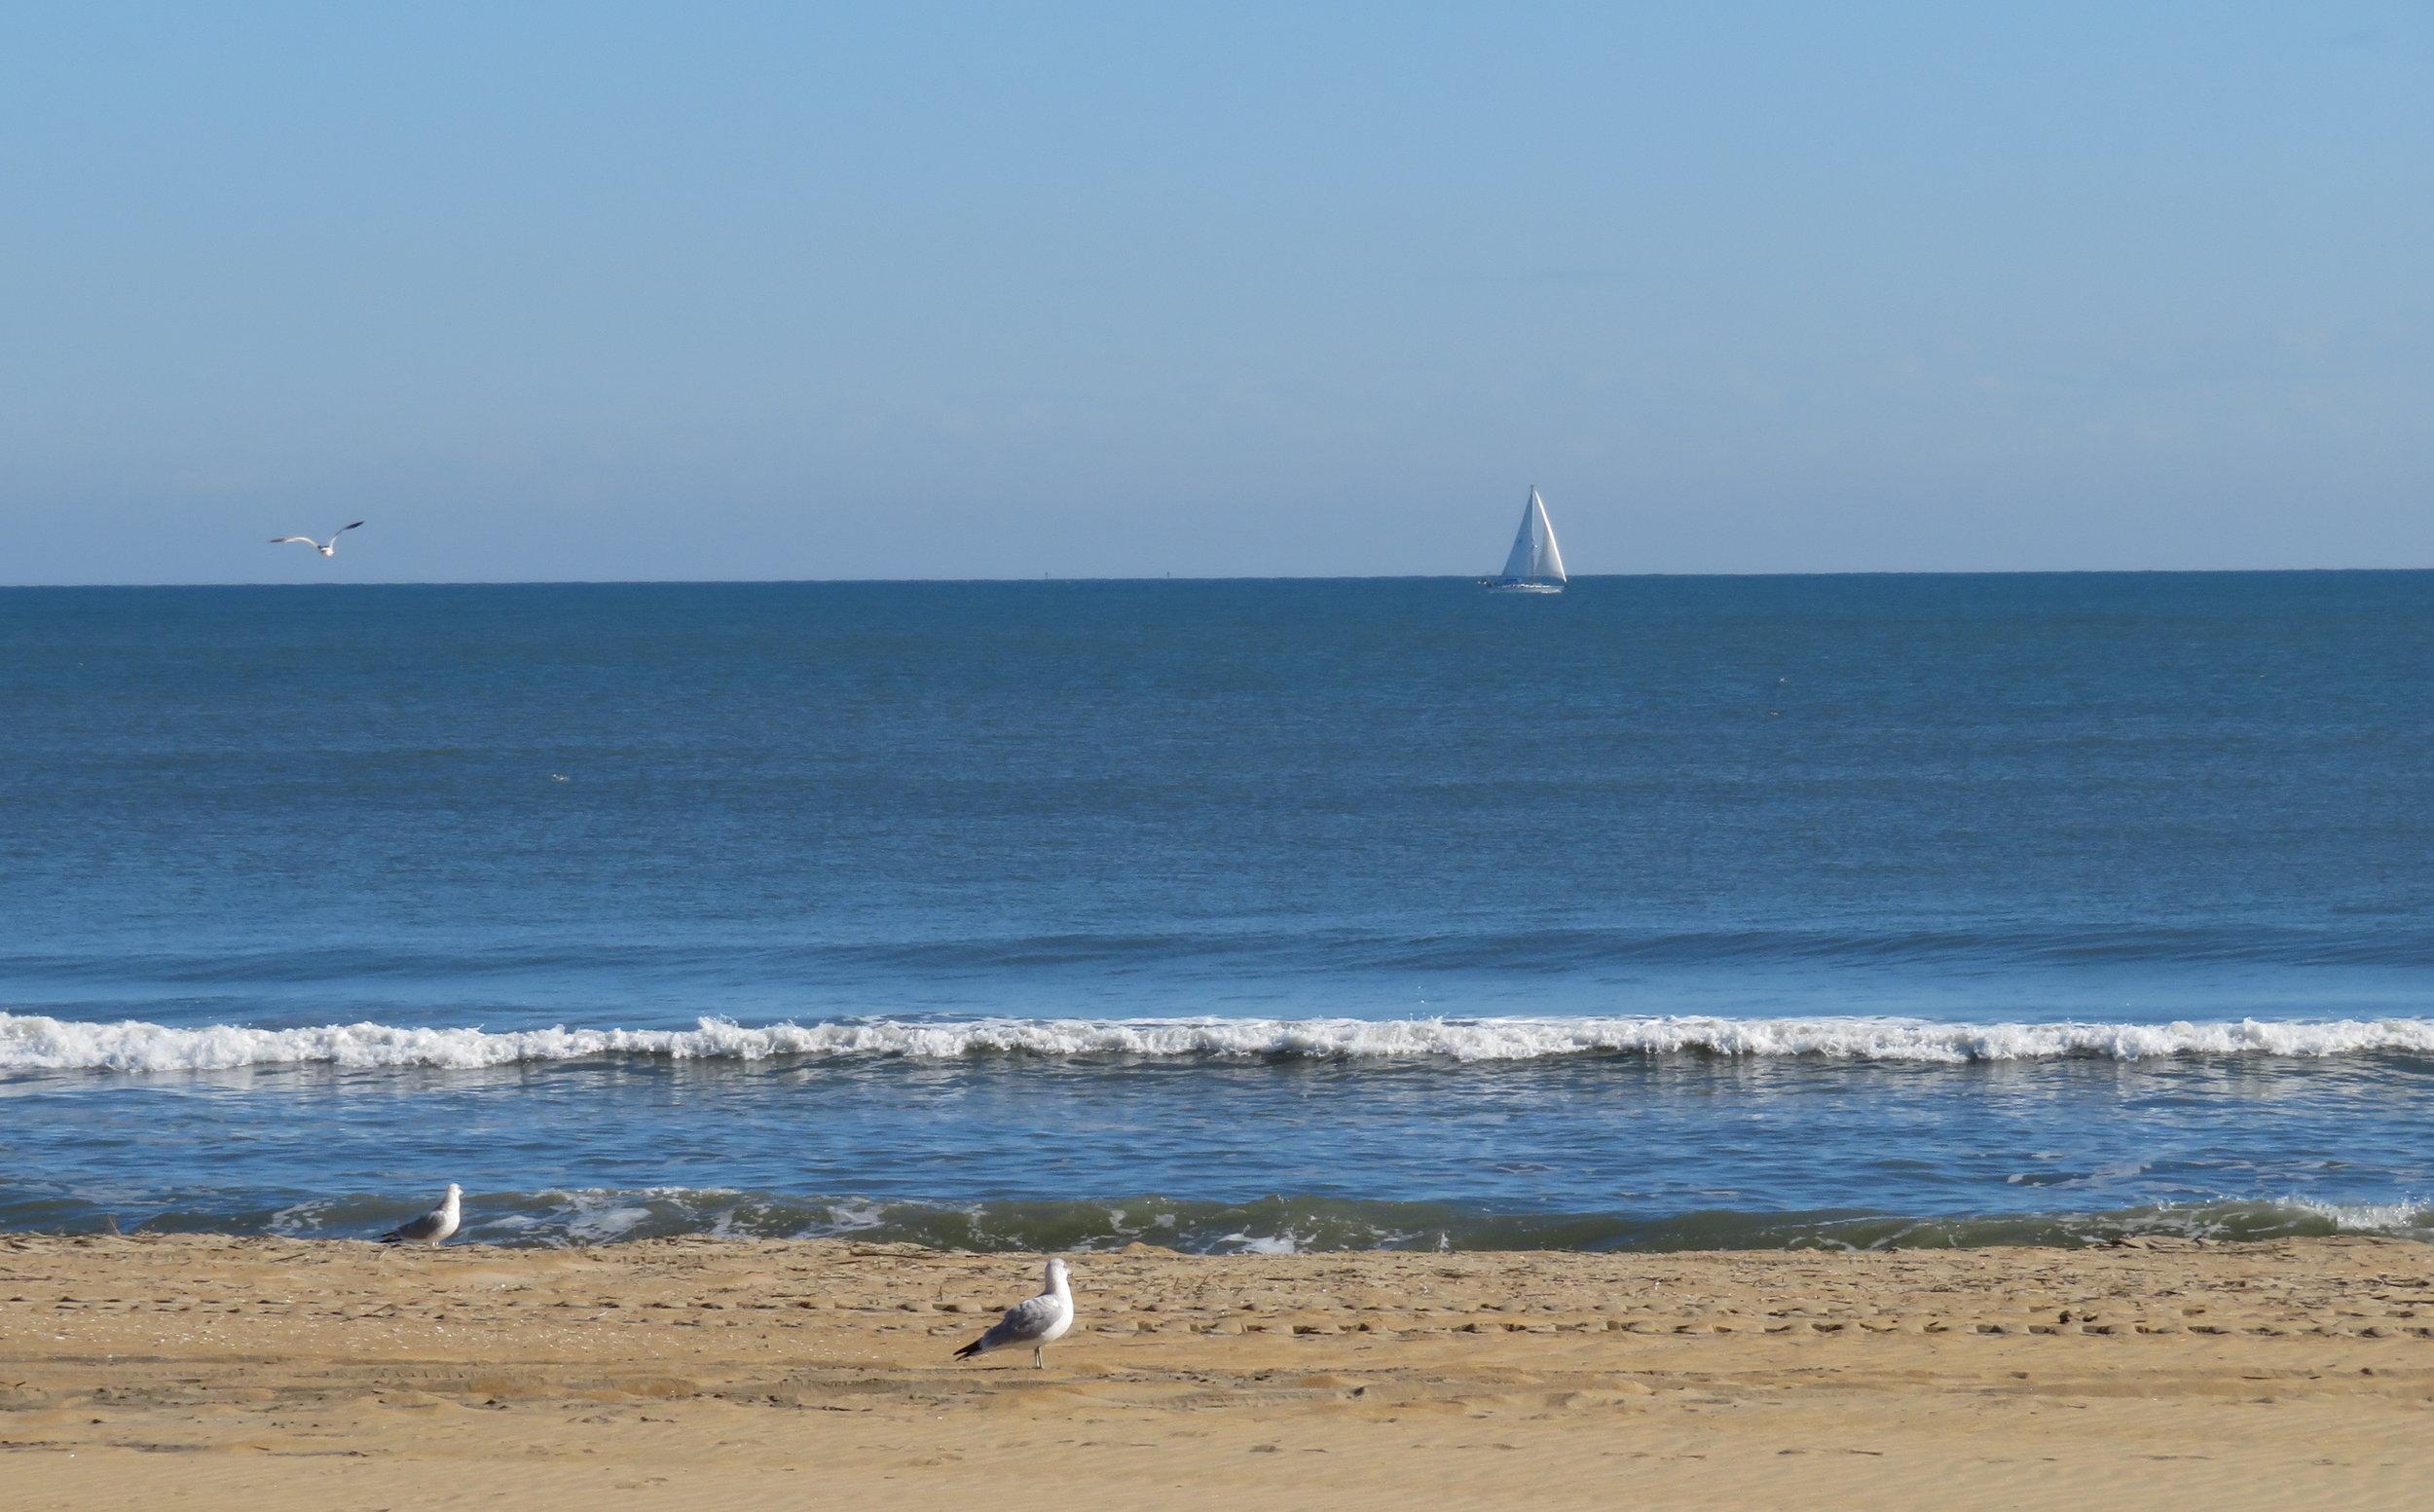 A lone sailboat skimmed along the horizon.